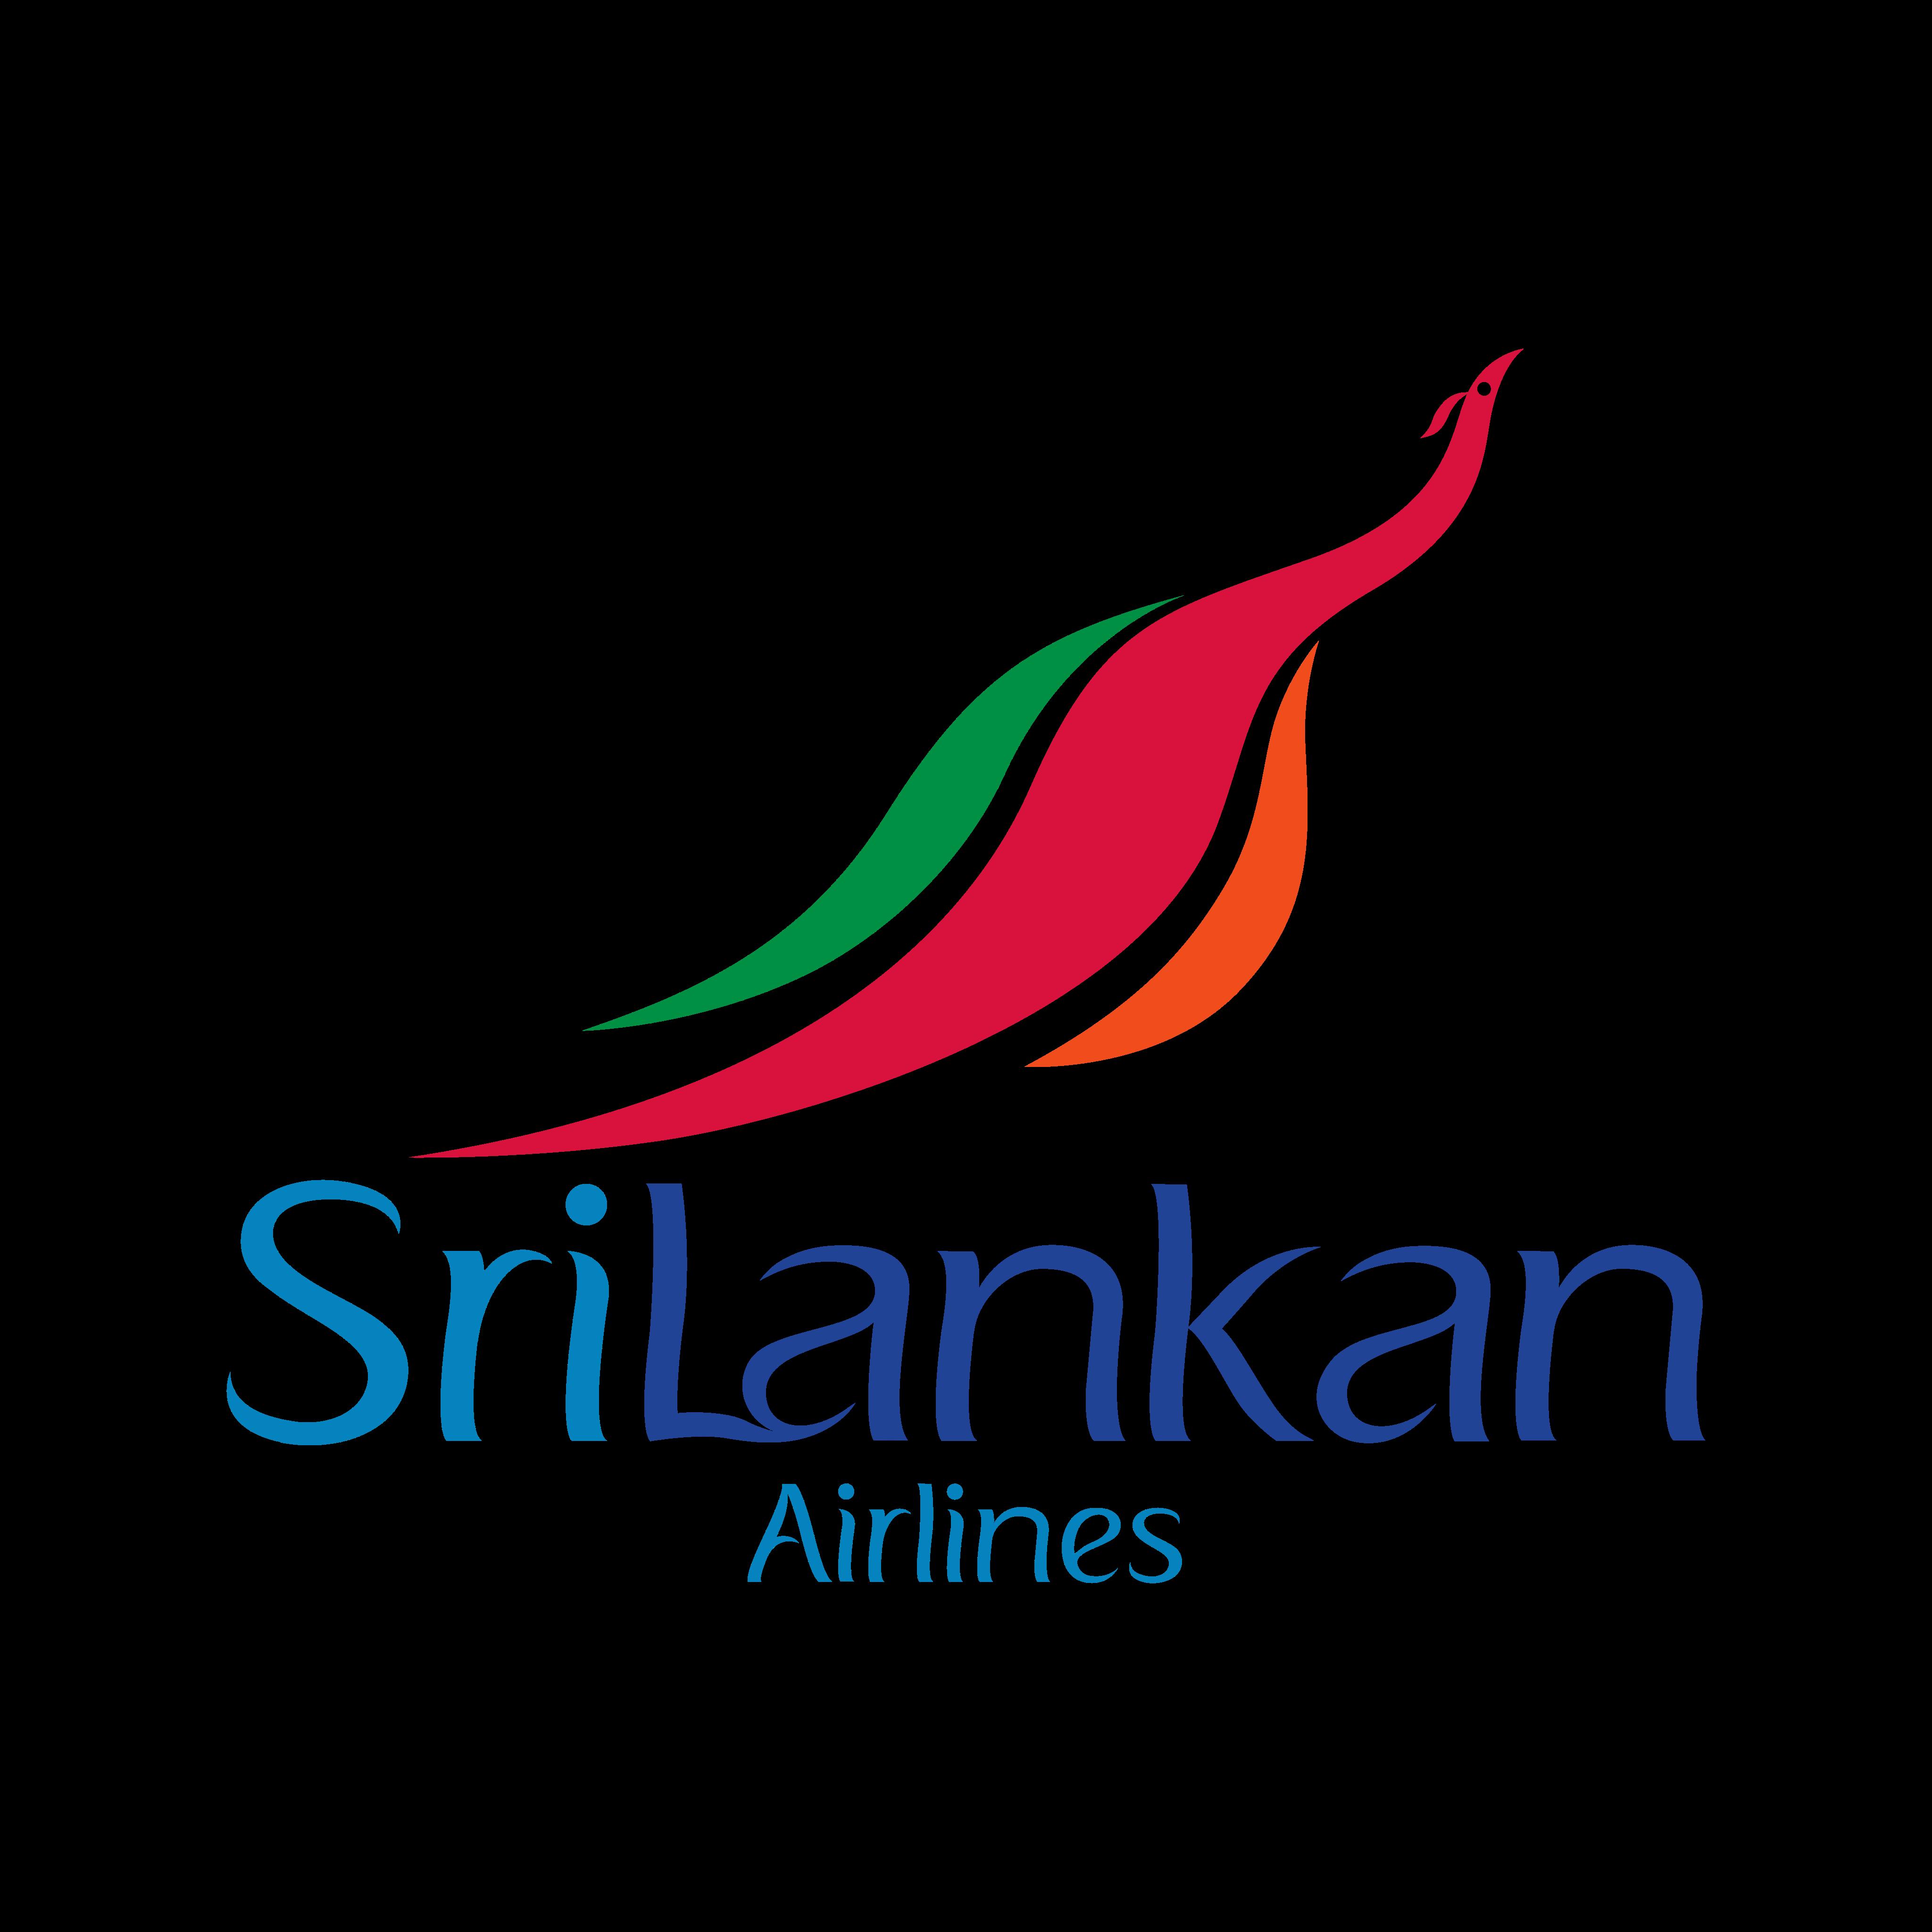 srilankan airlines logo 0 - SriLankan Airlines Logo